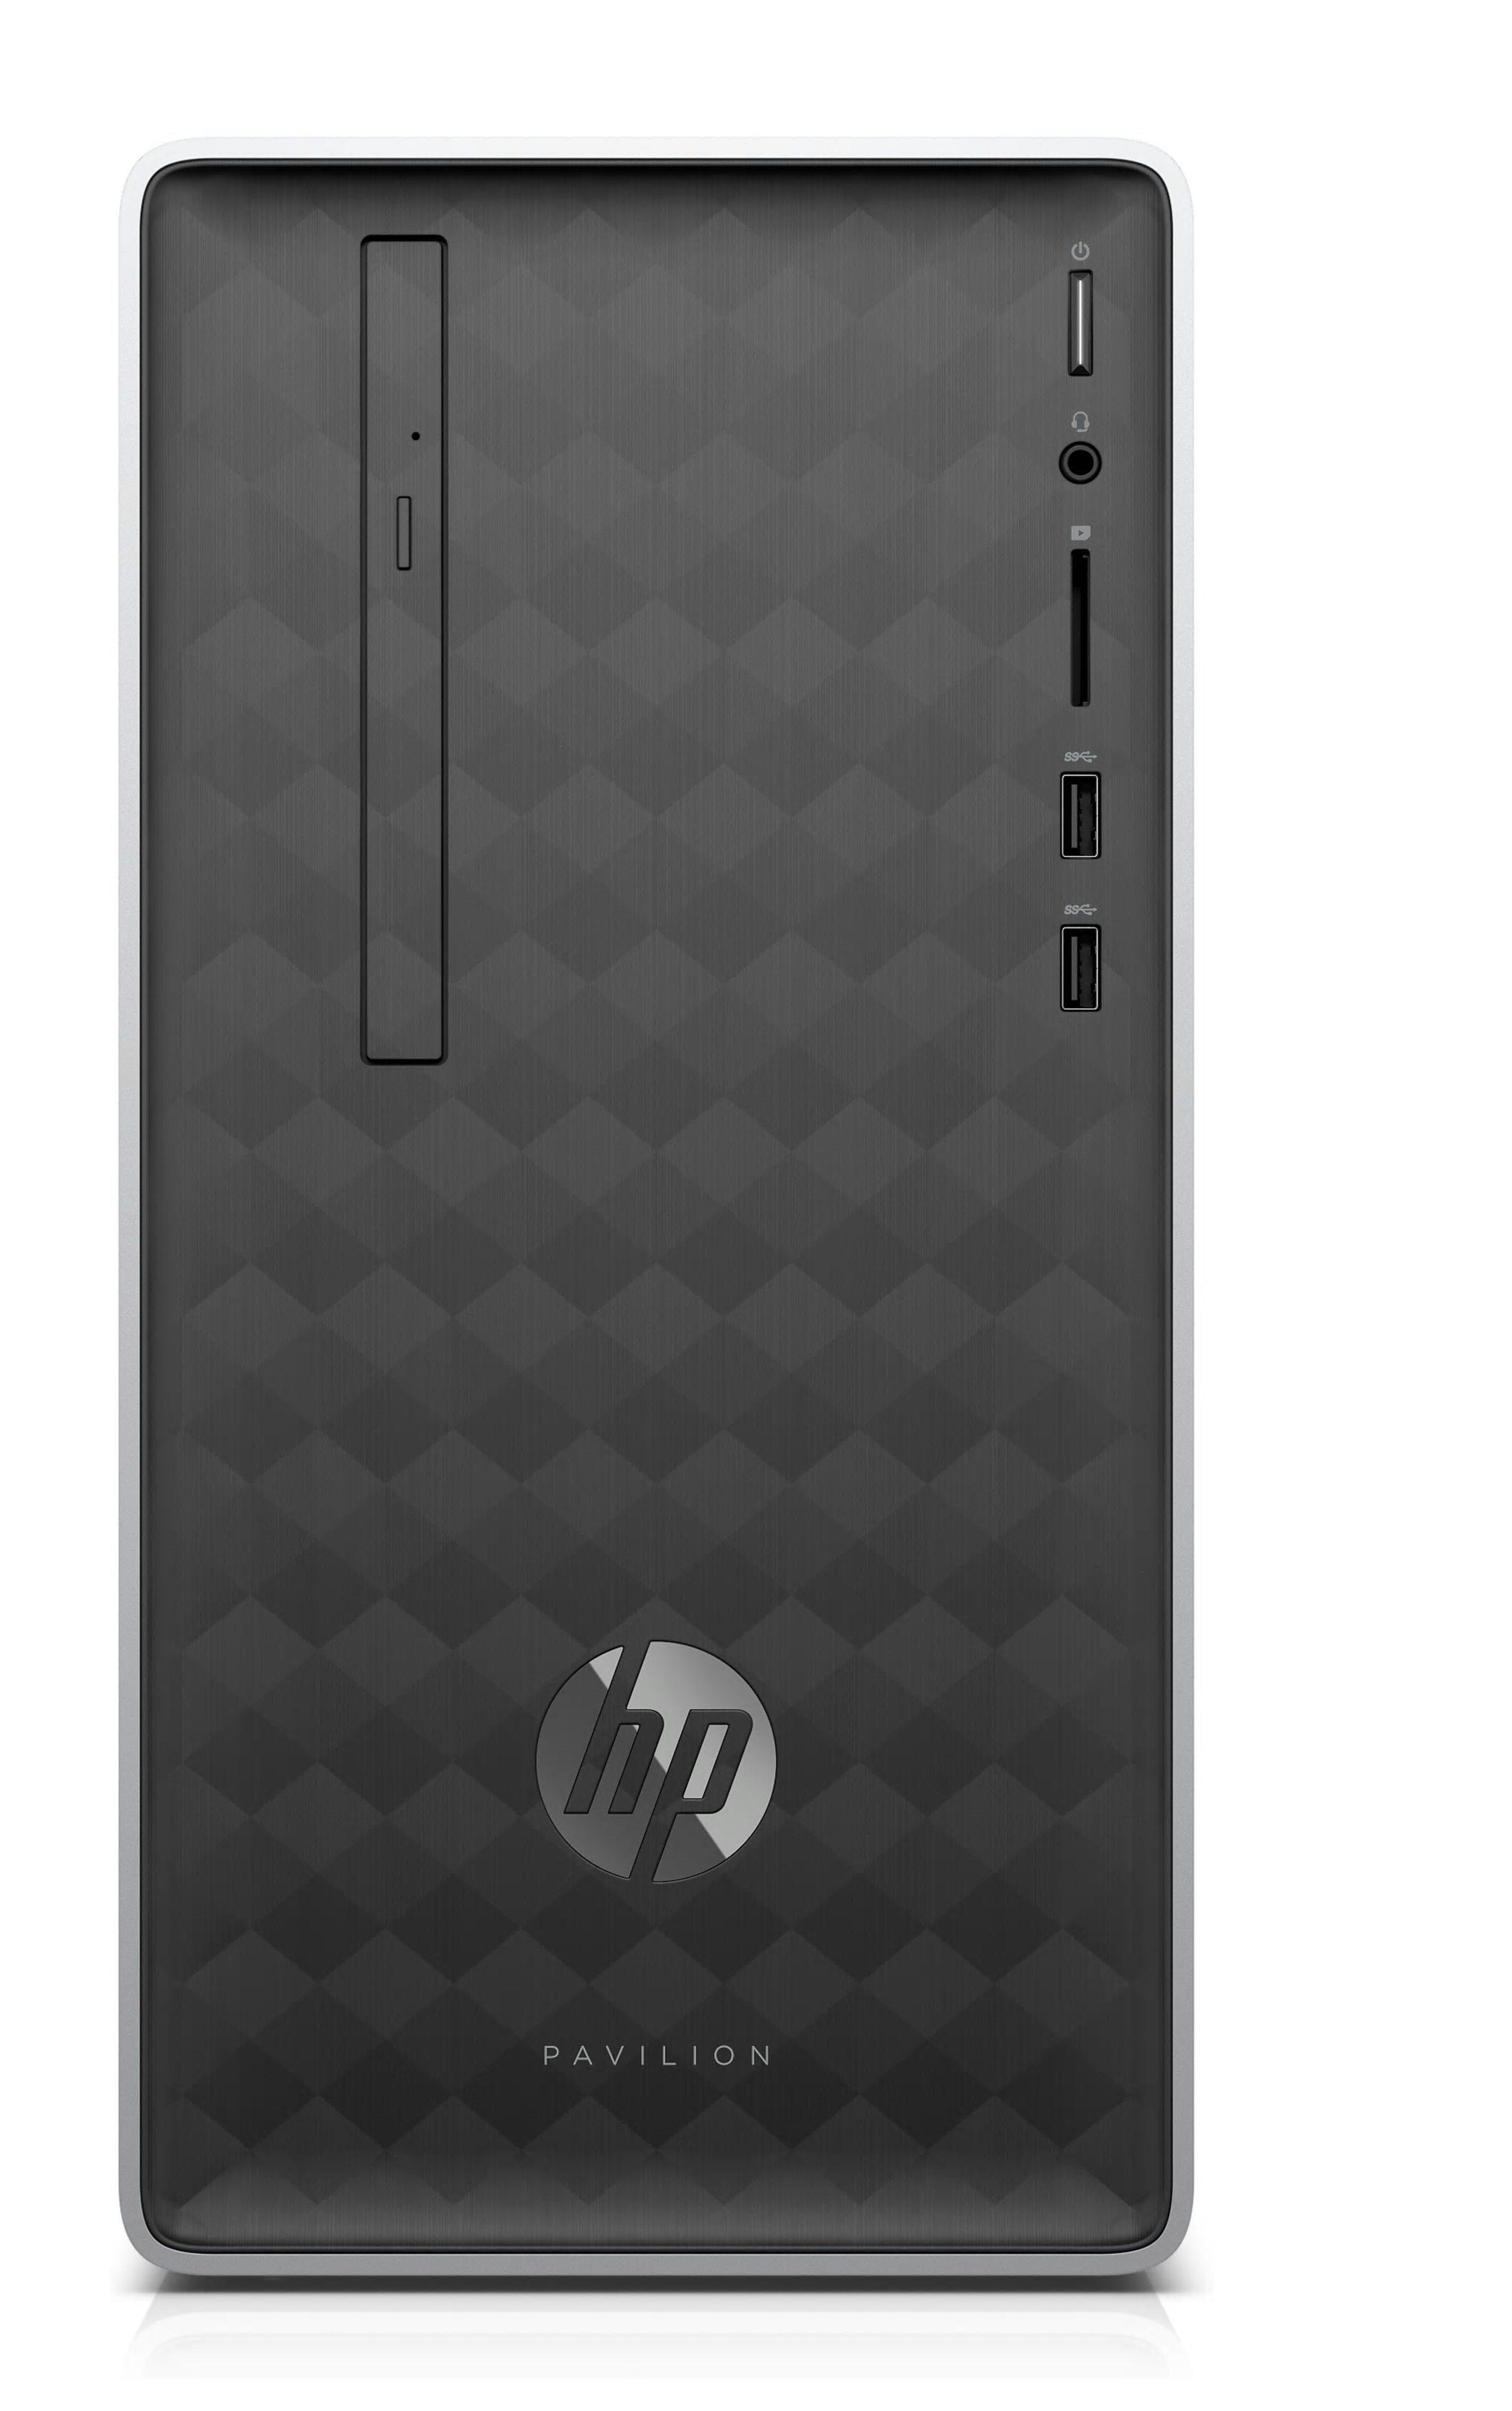 HP Pavilion 590-a0312ng Desktop PC »AMD Dual-Core A9, AMD Radeon R5,128 GB+1 TB, 8 GB«